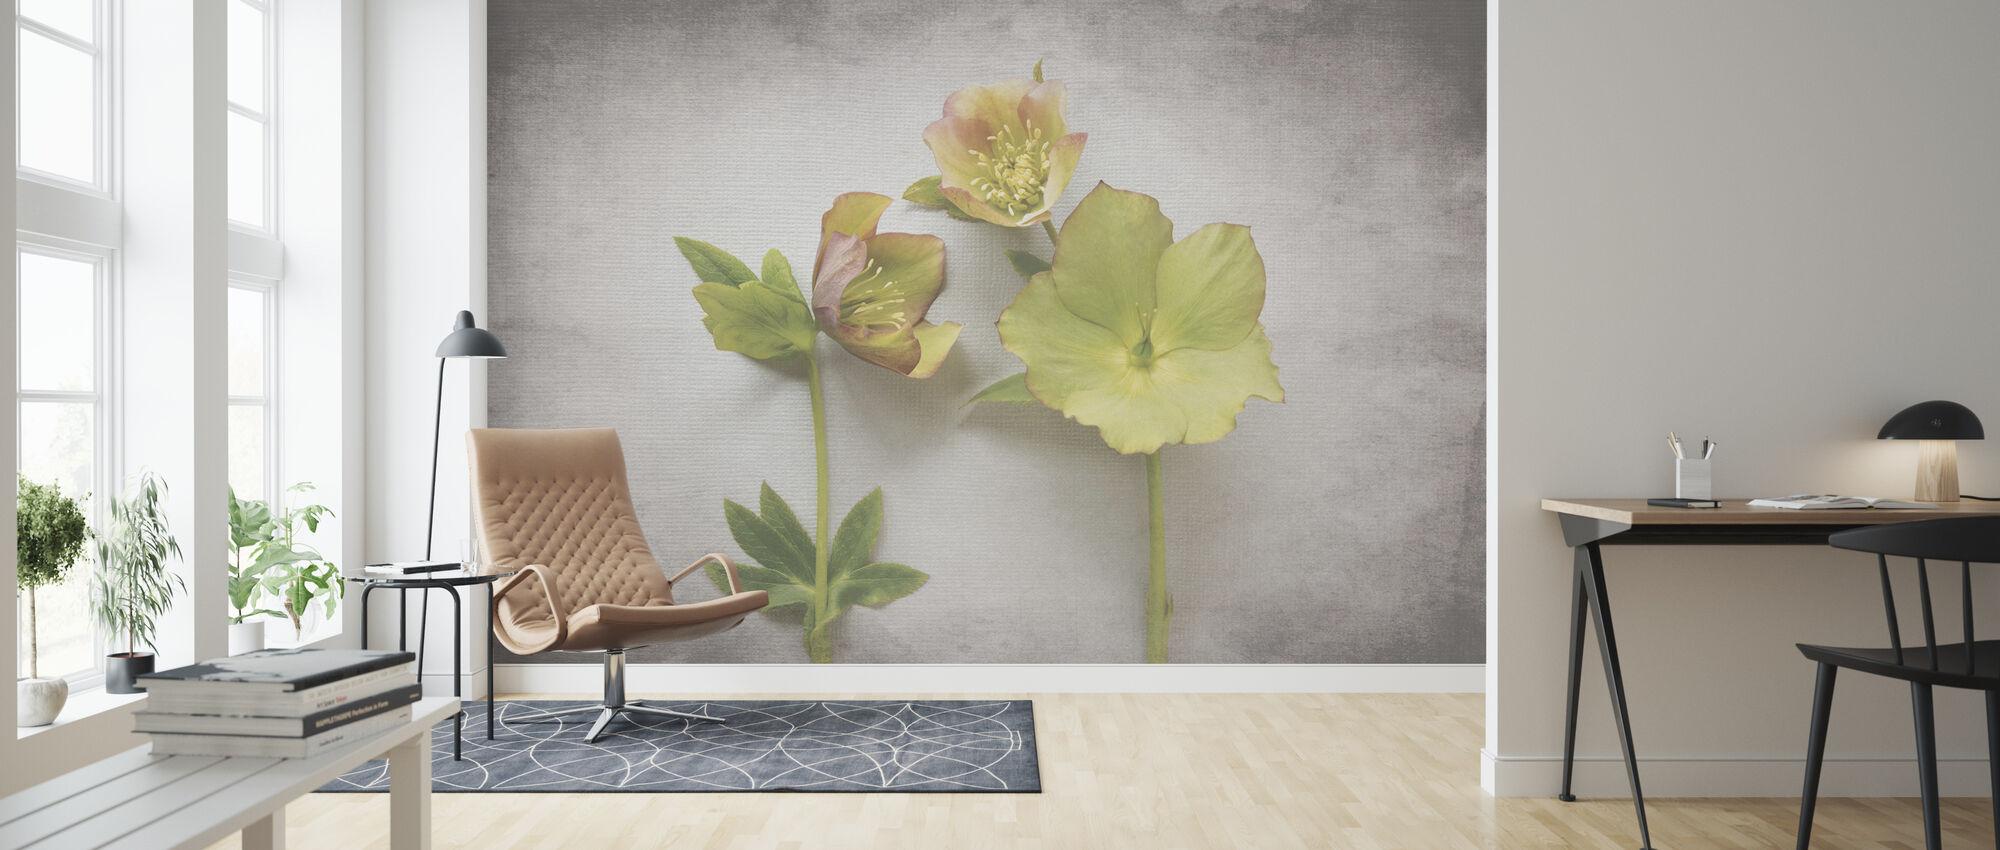 Vintage Hellebore Study IV - Wallpaper - Living Room